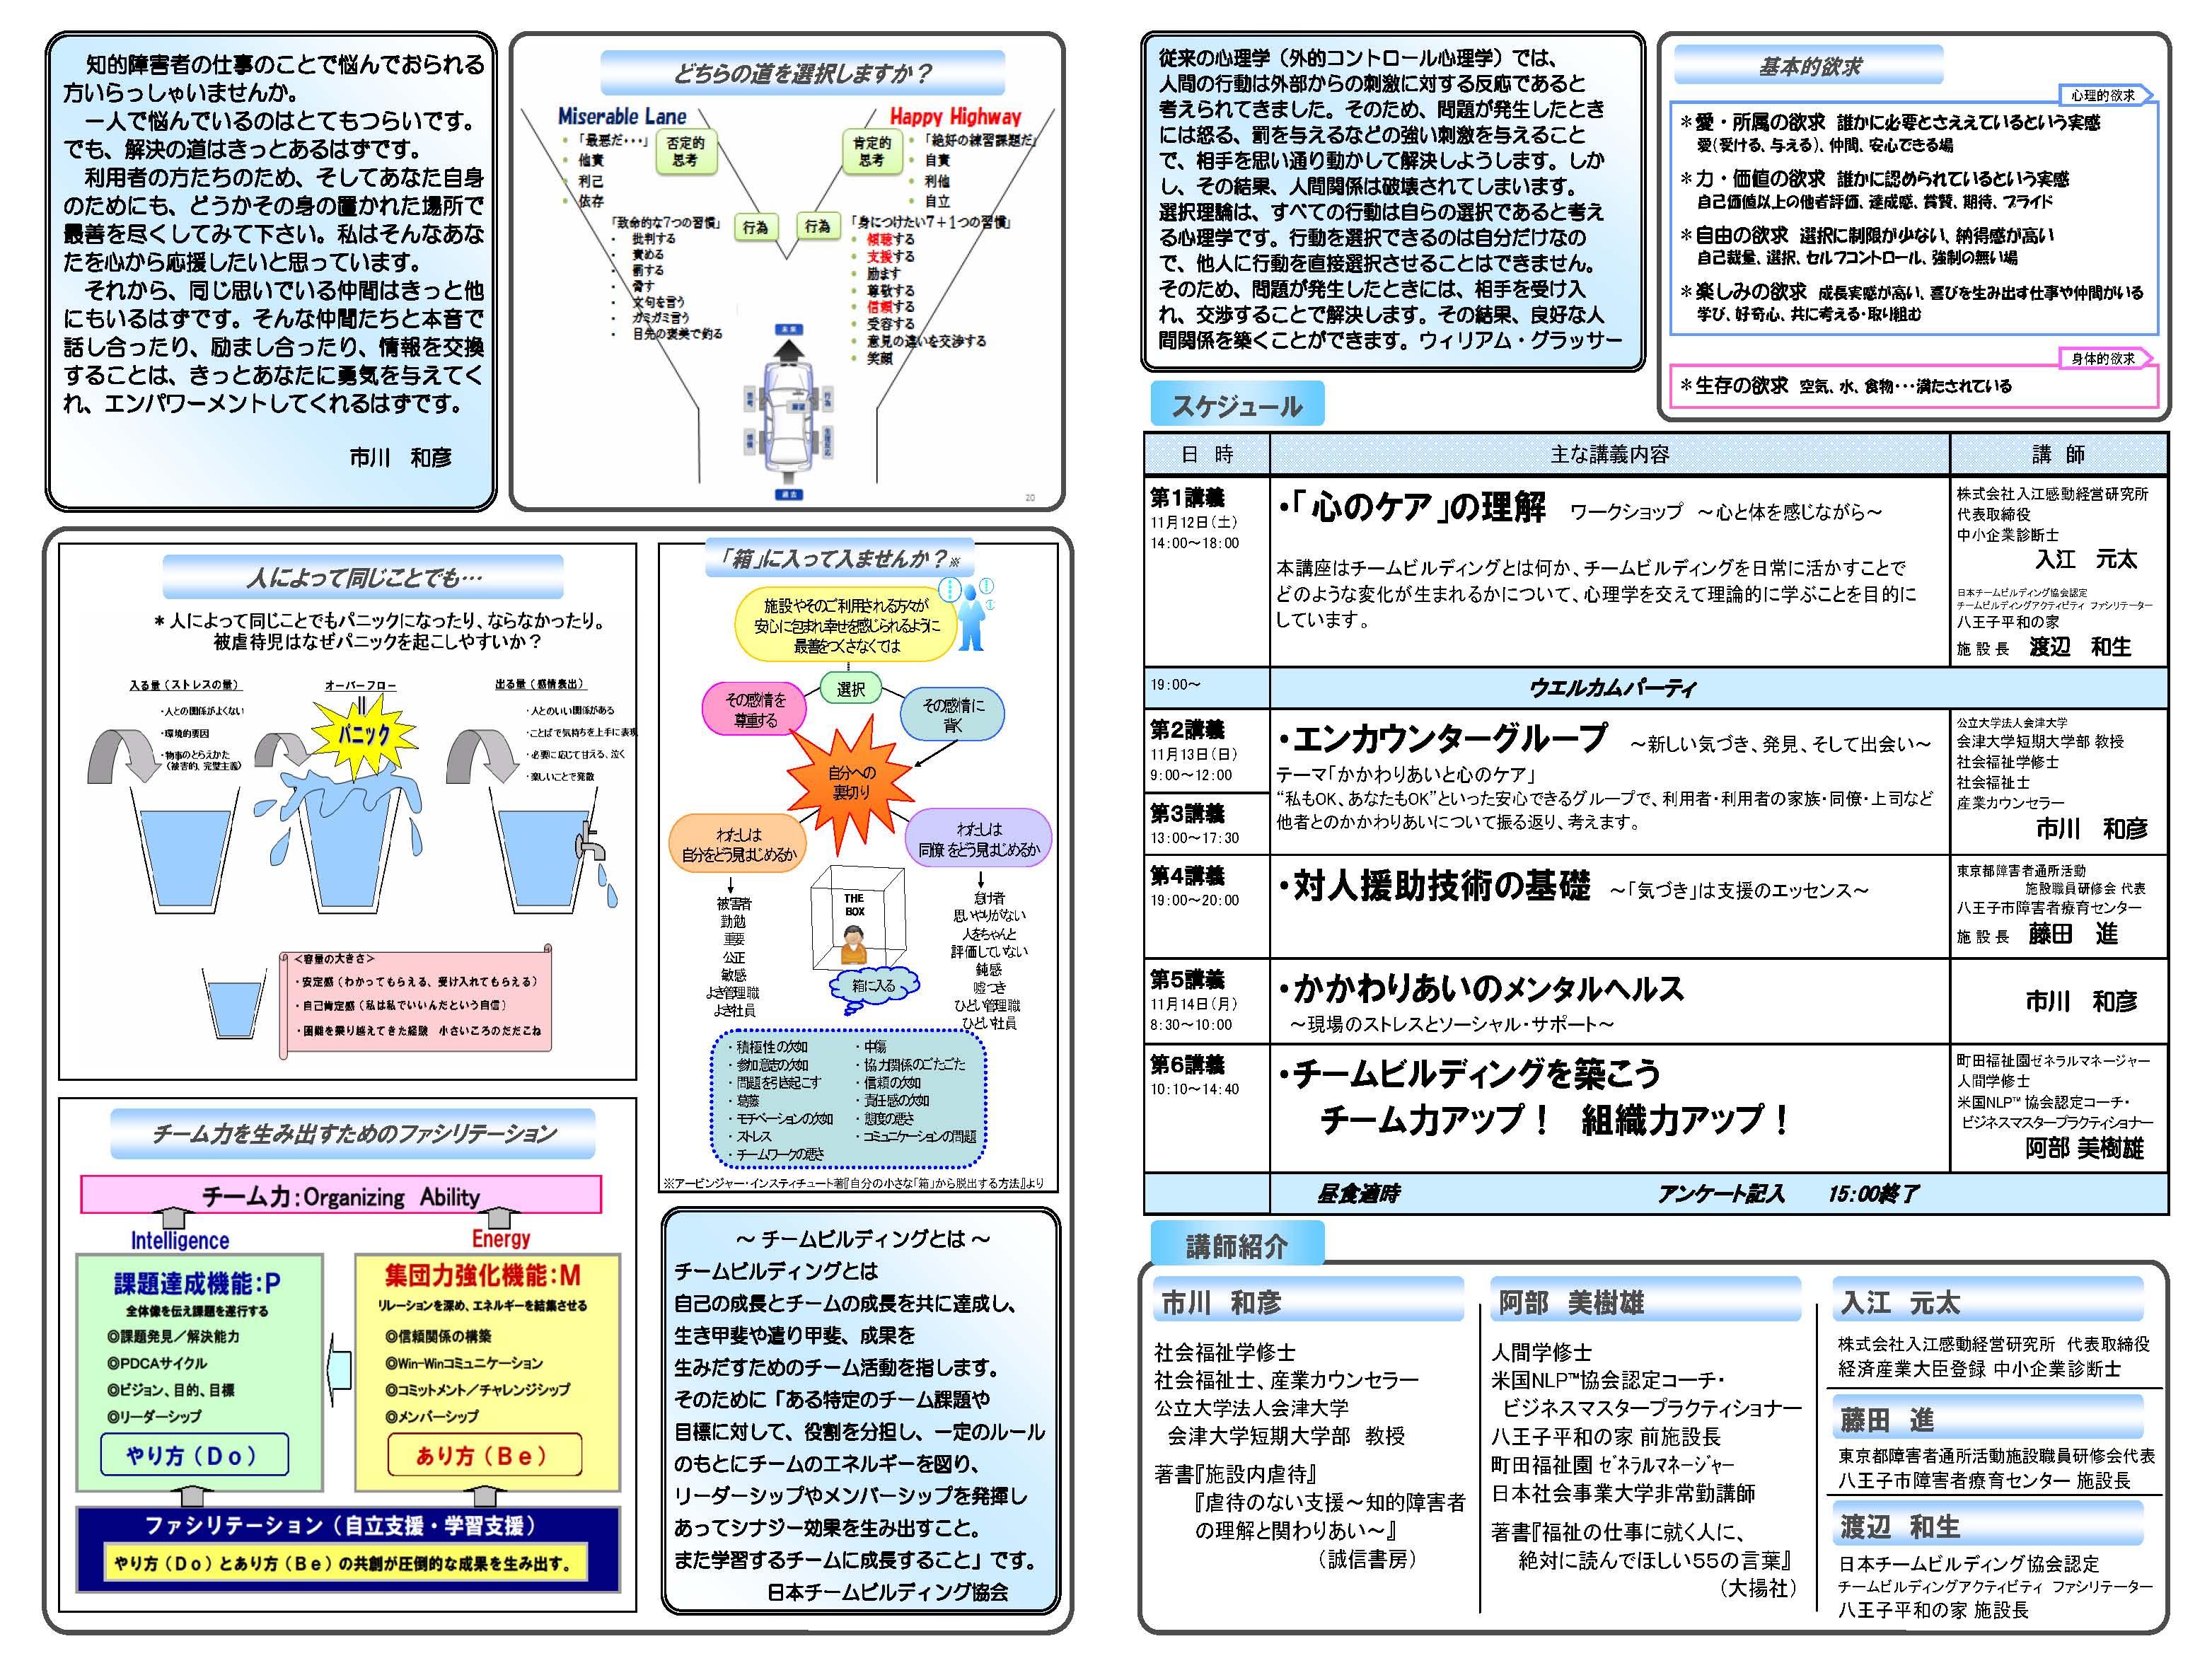 kokoro_2011_aki_2.jpg